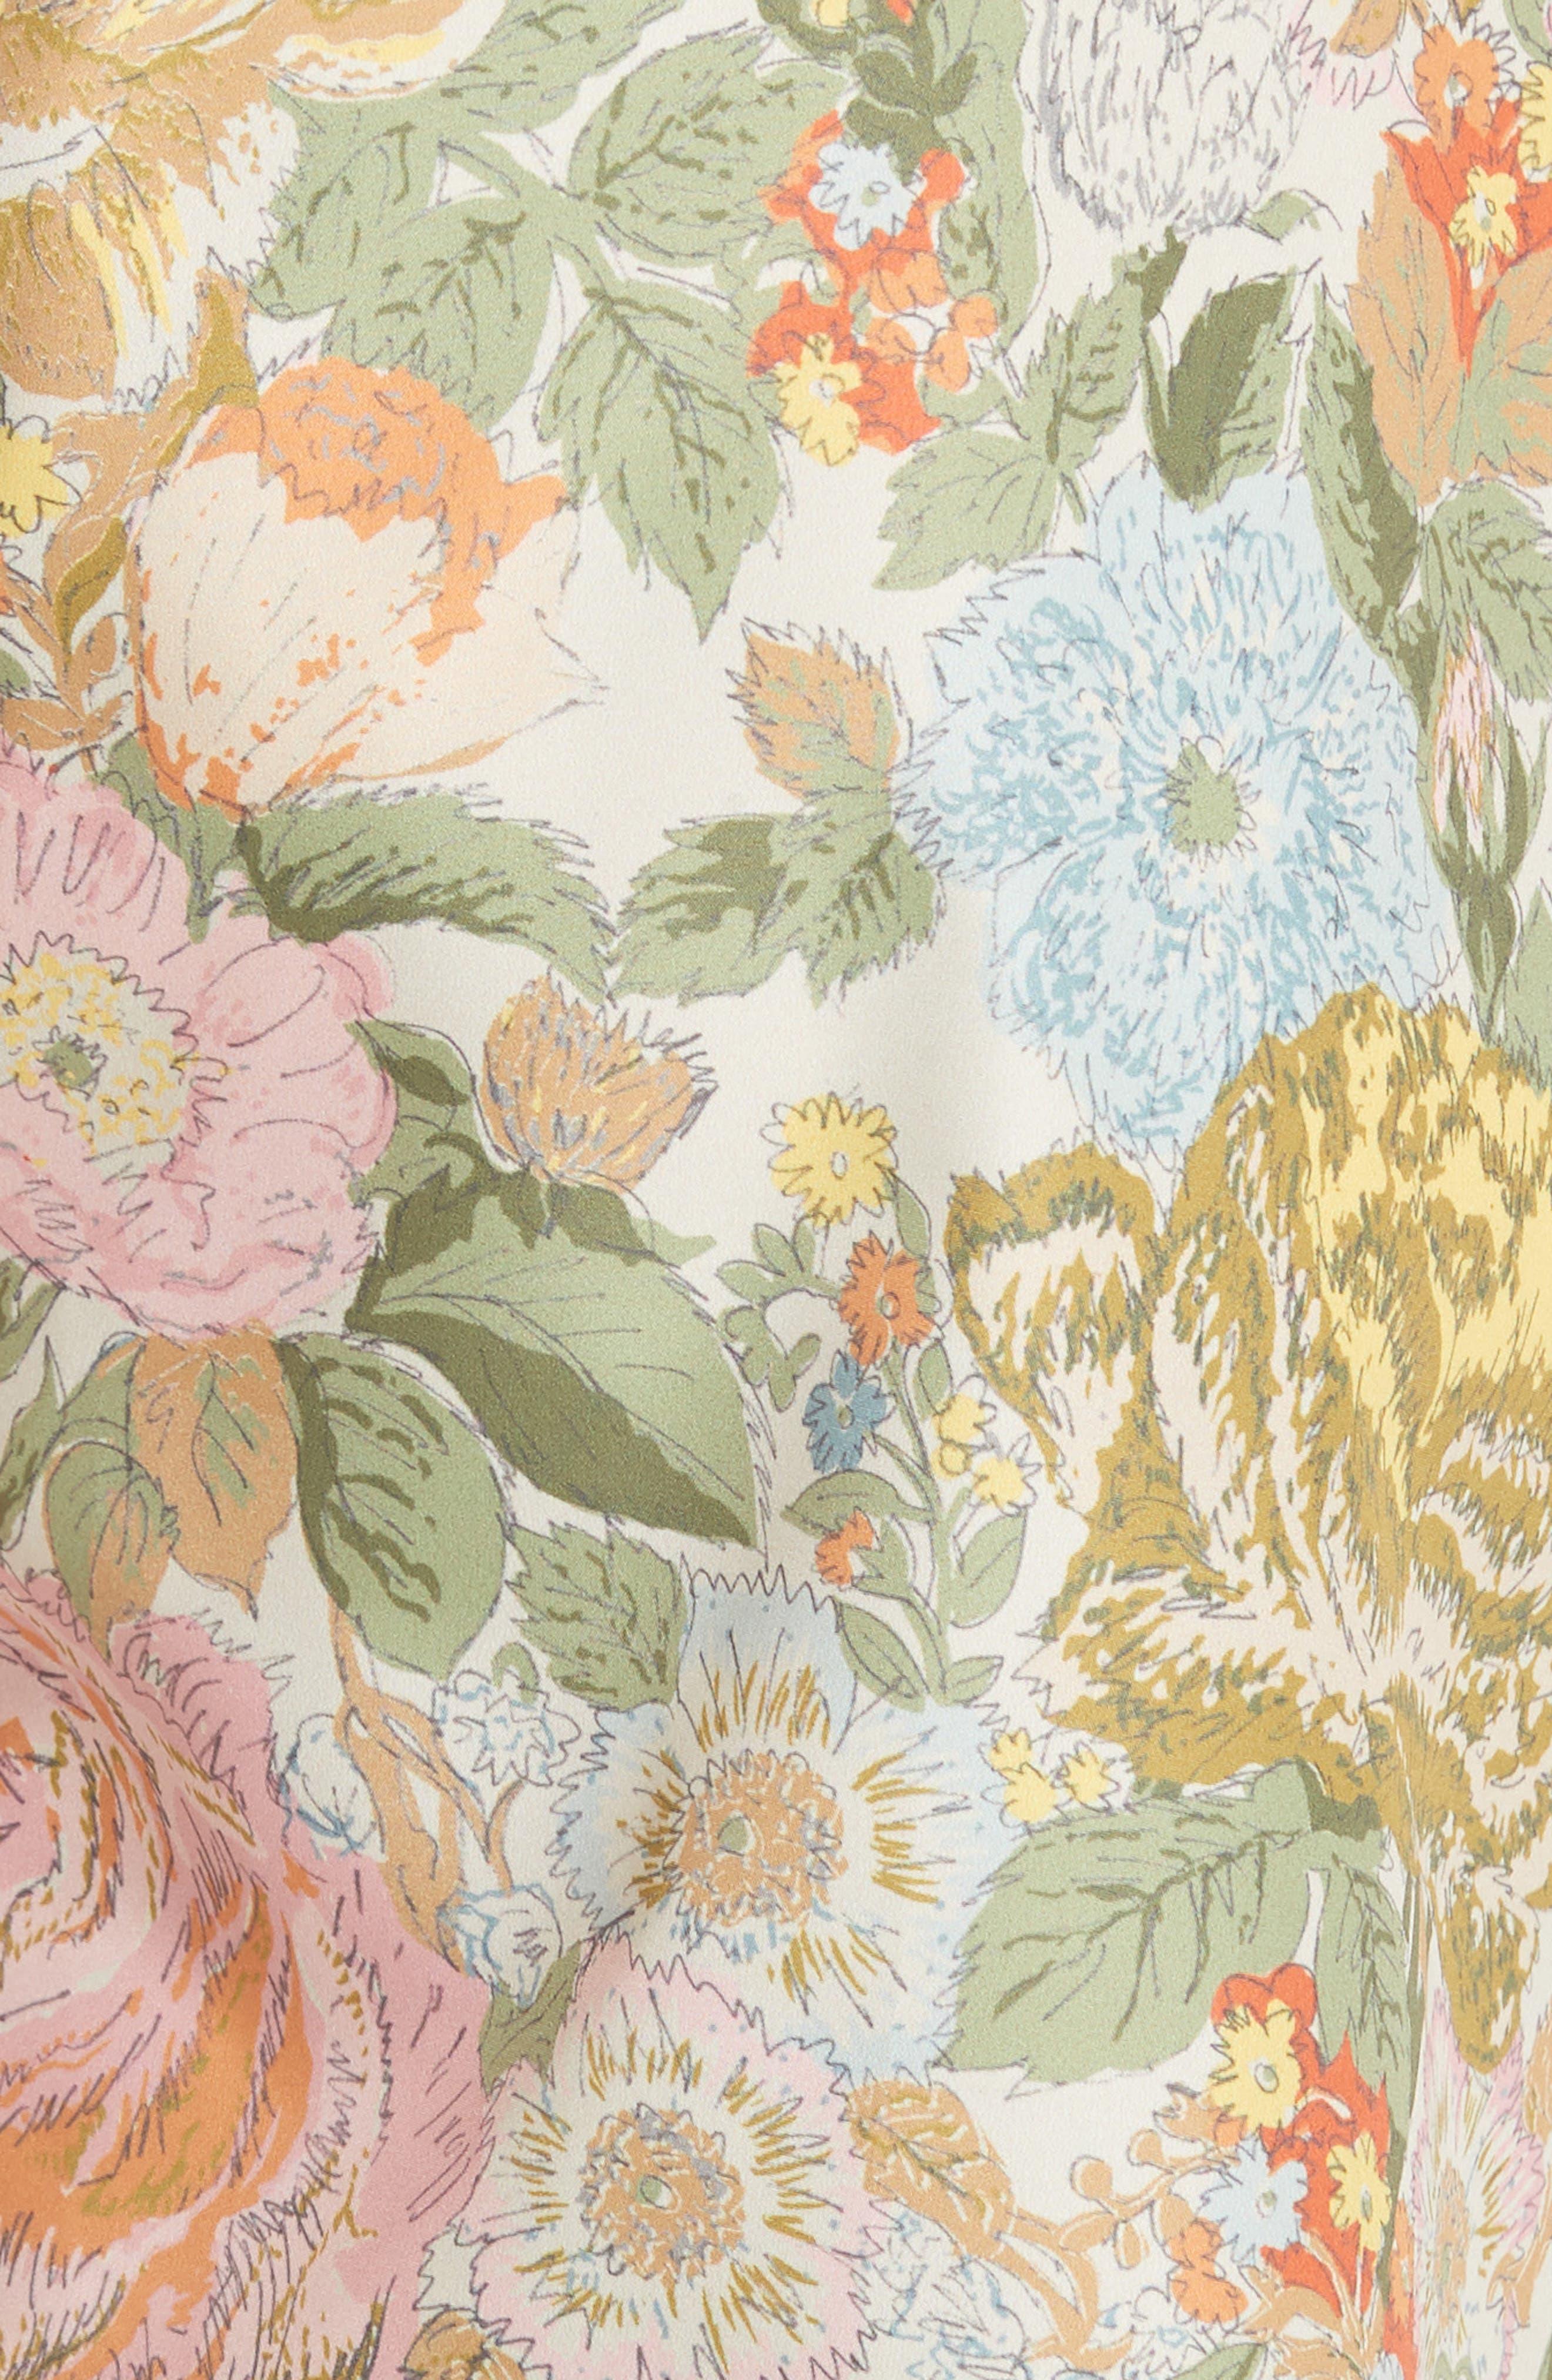 Guildes Floral Print Swim Trunks,                             Alternate thumbnail 5, color,                             Bright Orange